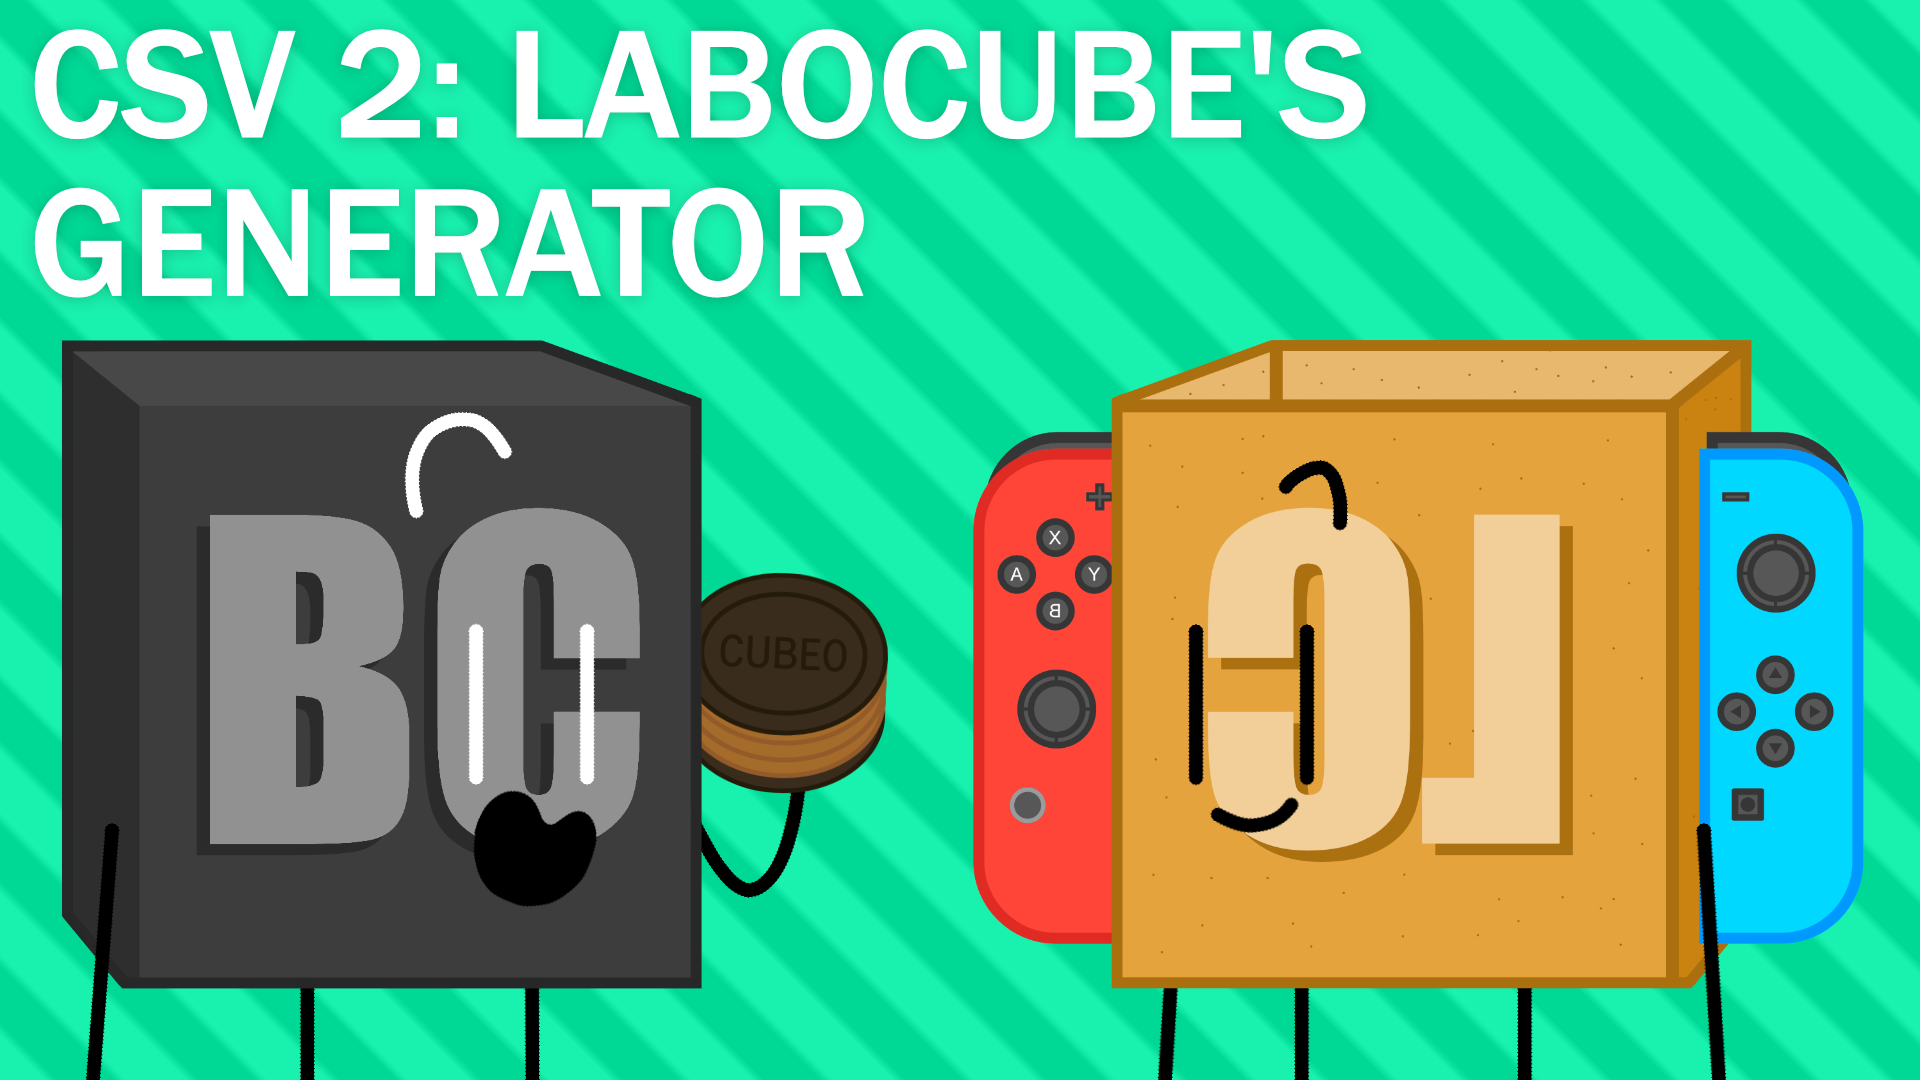 Labocube's Generator | Gold Bars Series Wiki | FANDOM powered by Wikia